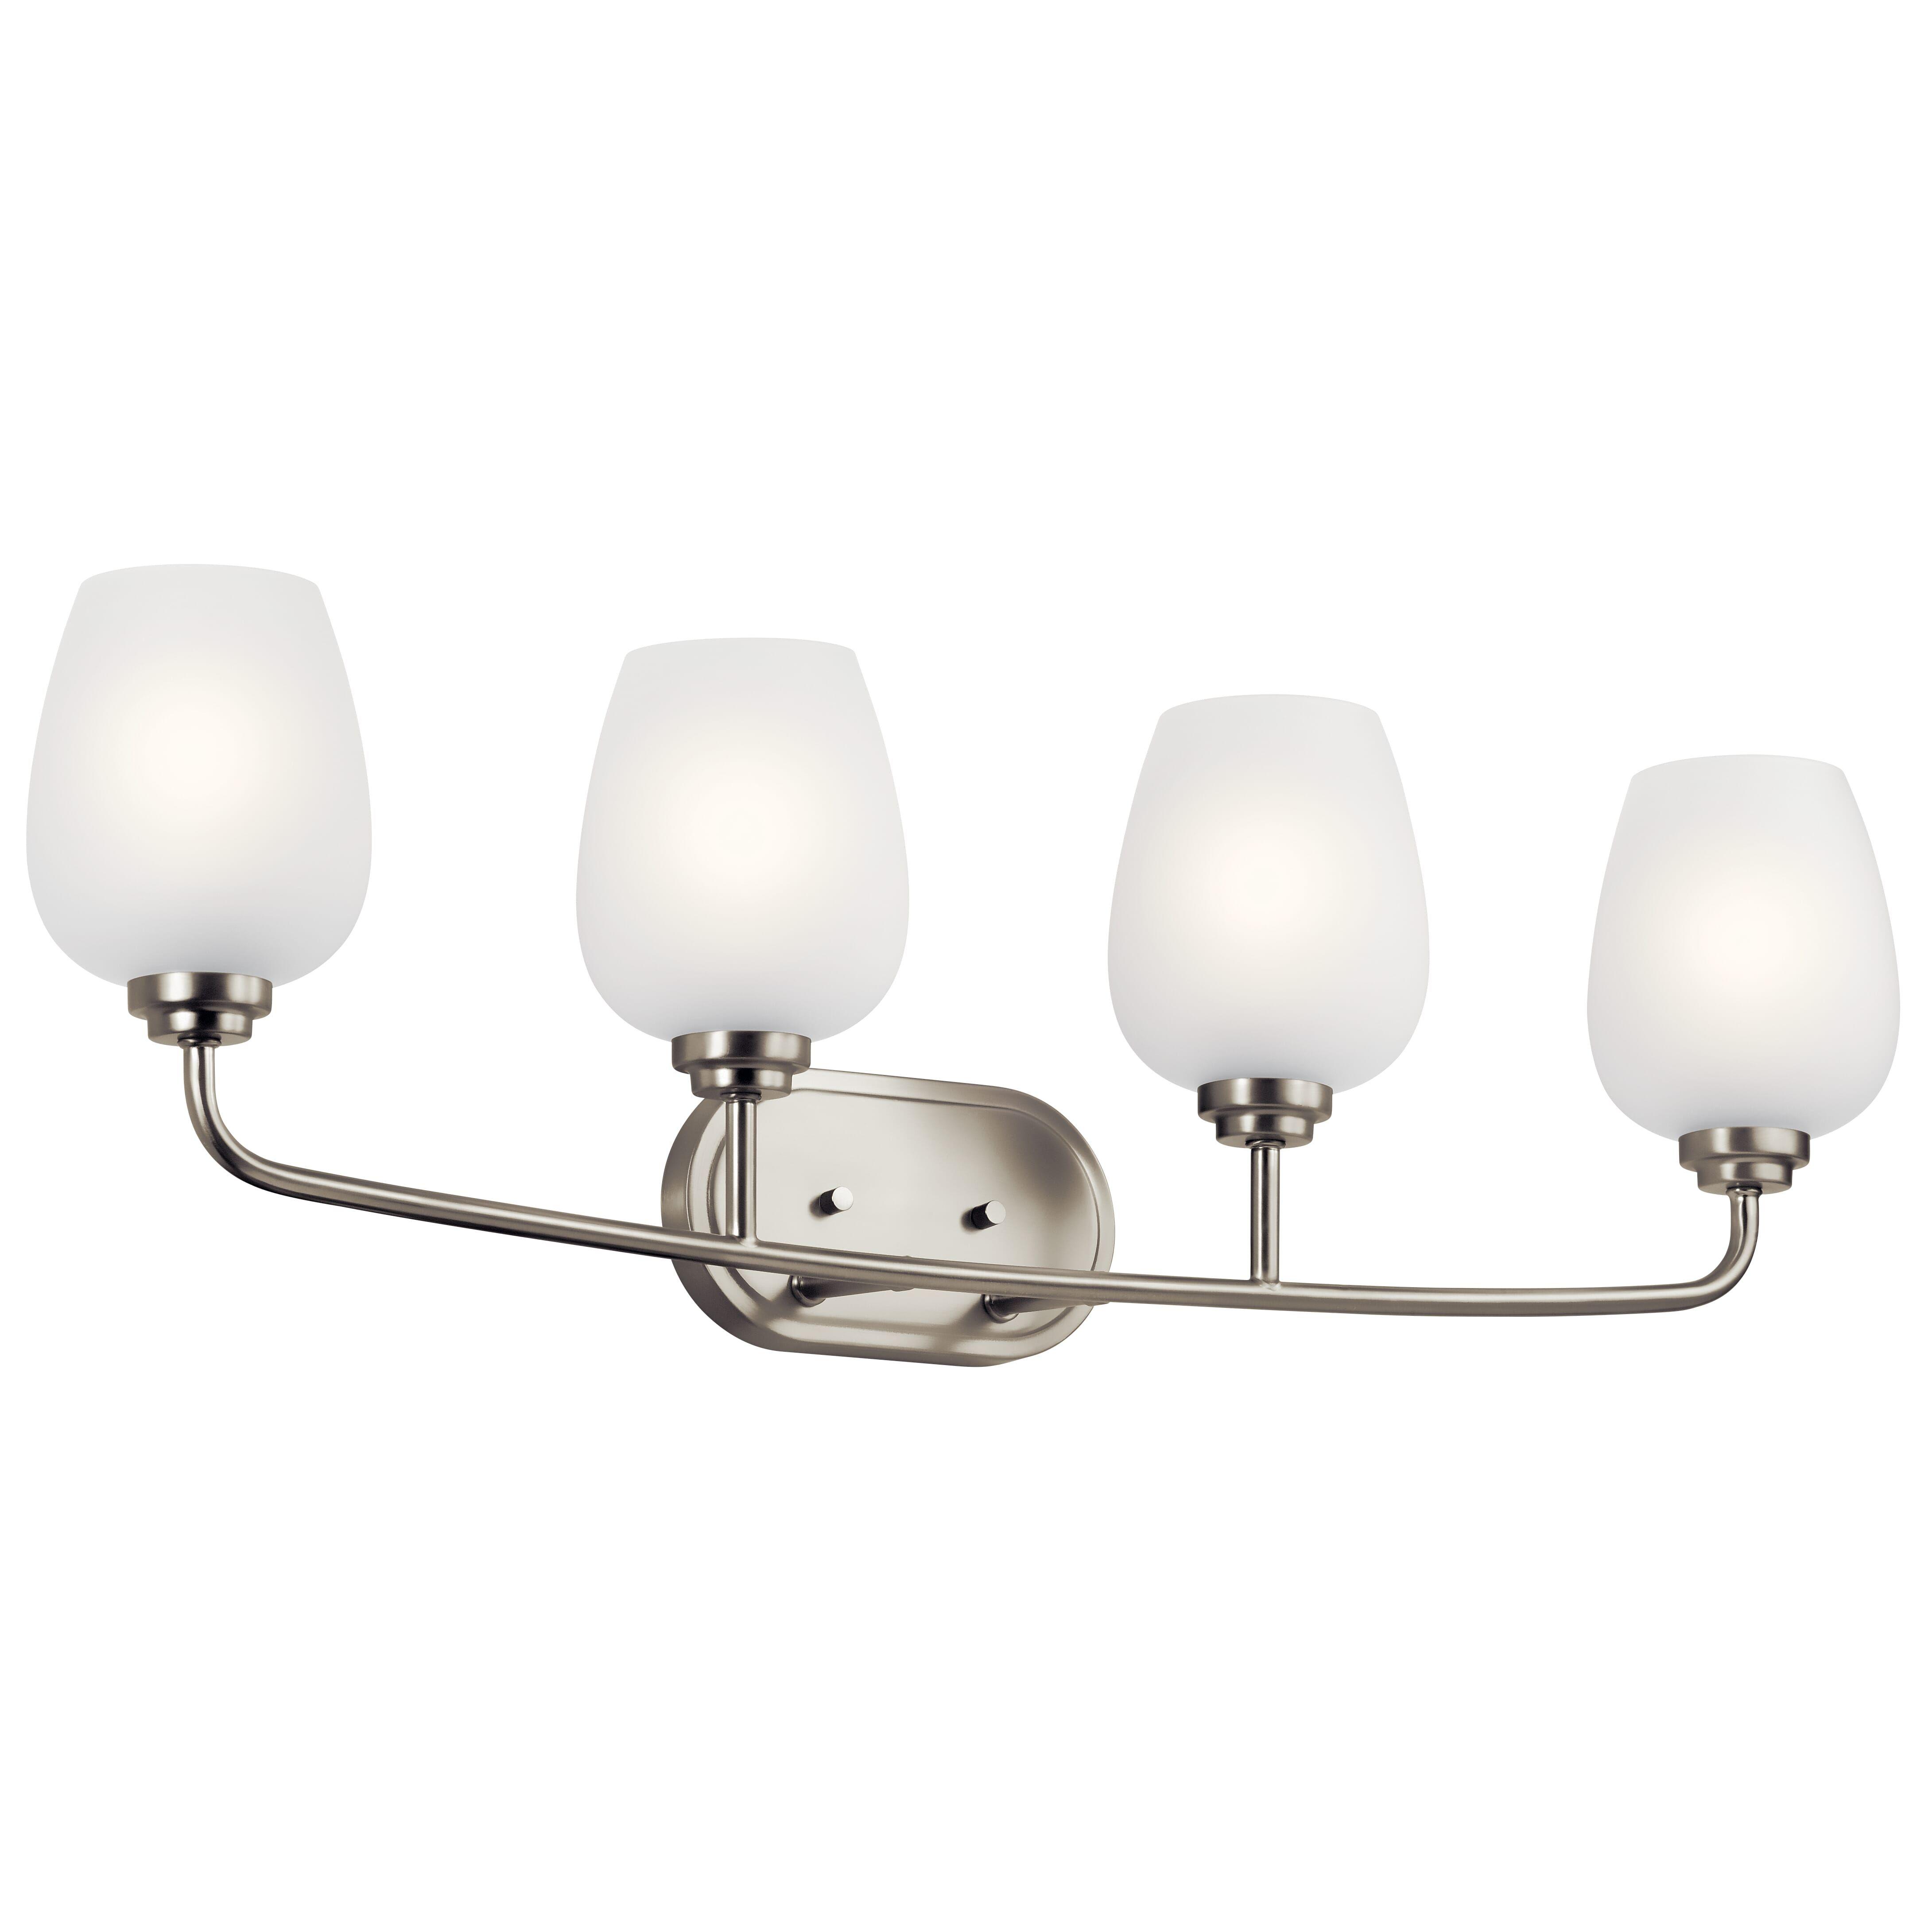 "Photo of Kichler Valserrano 4-Light 10 ""washstand lamp made of brushed nickel"